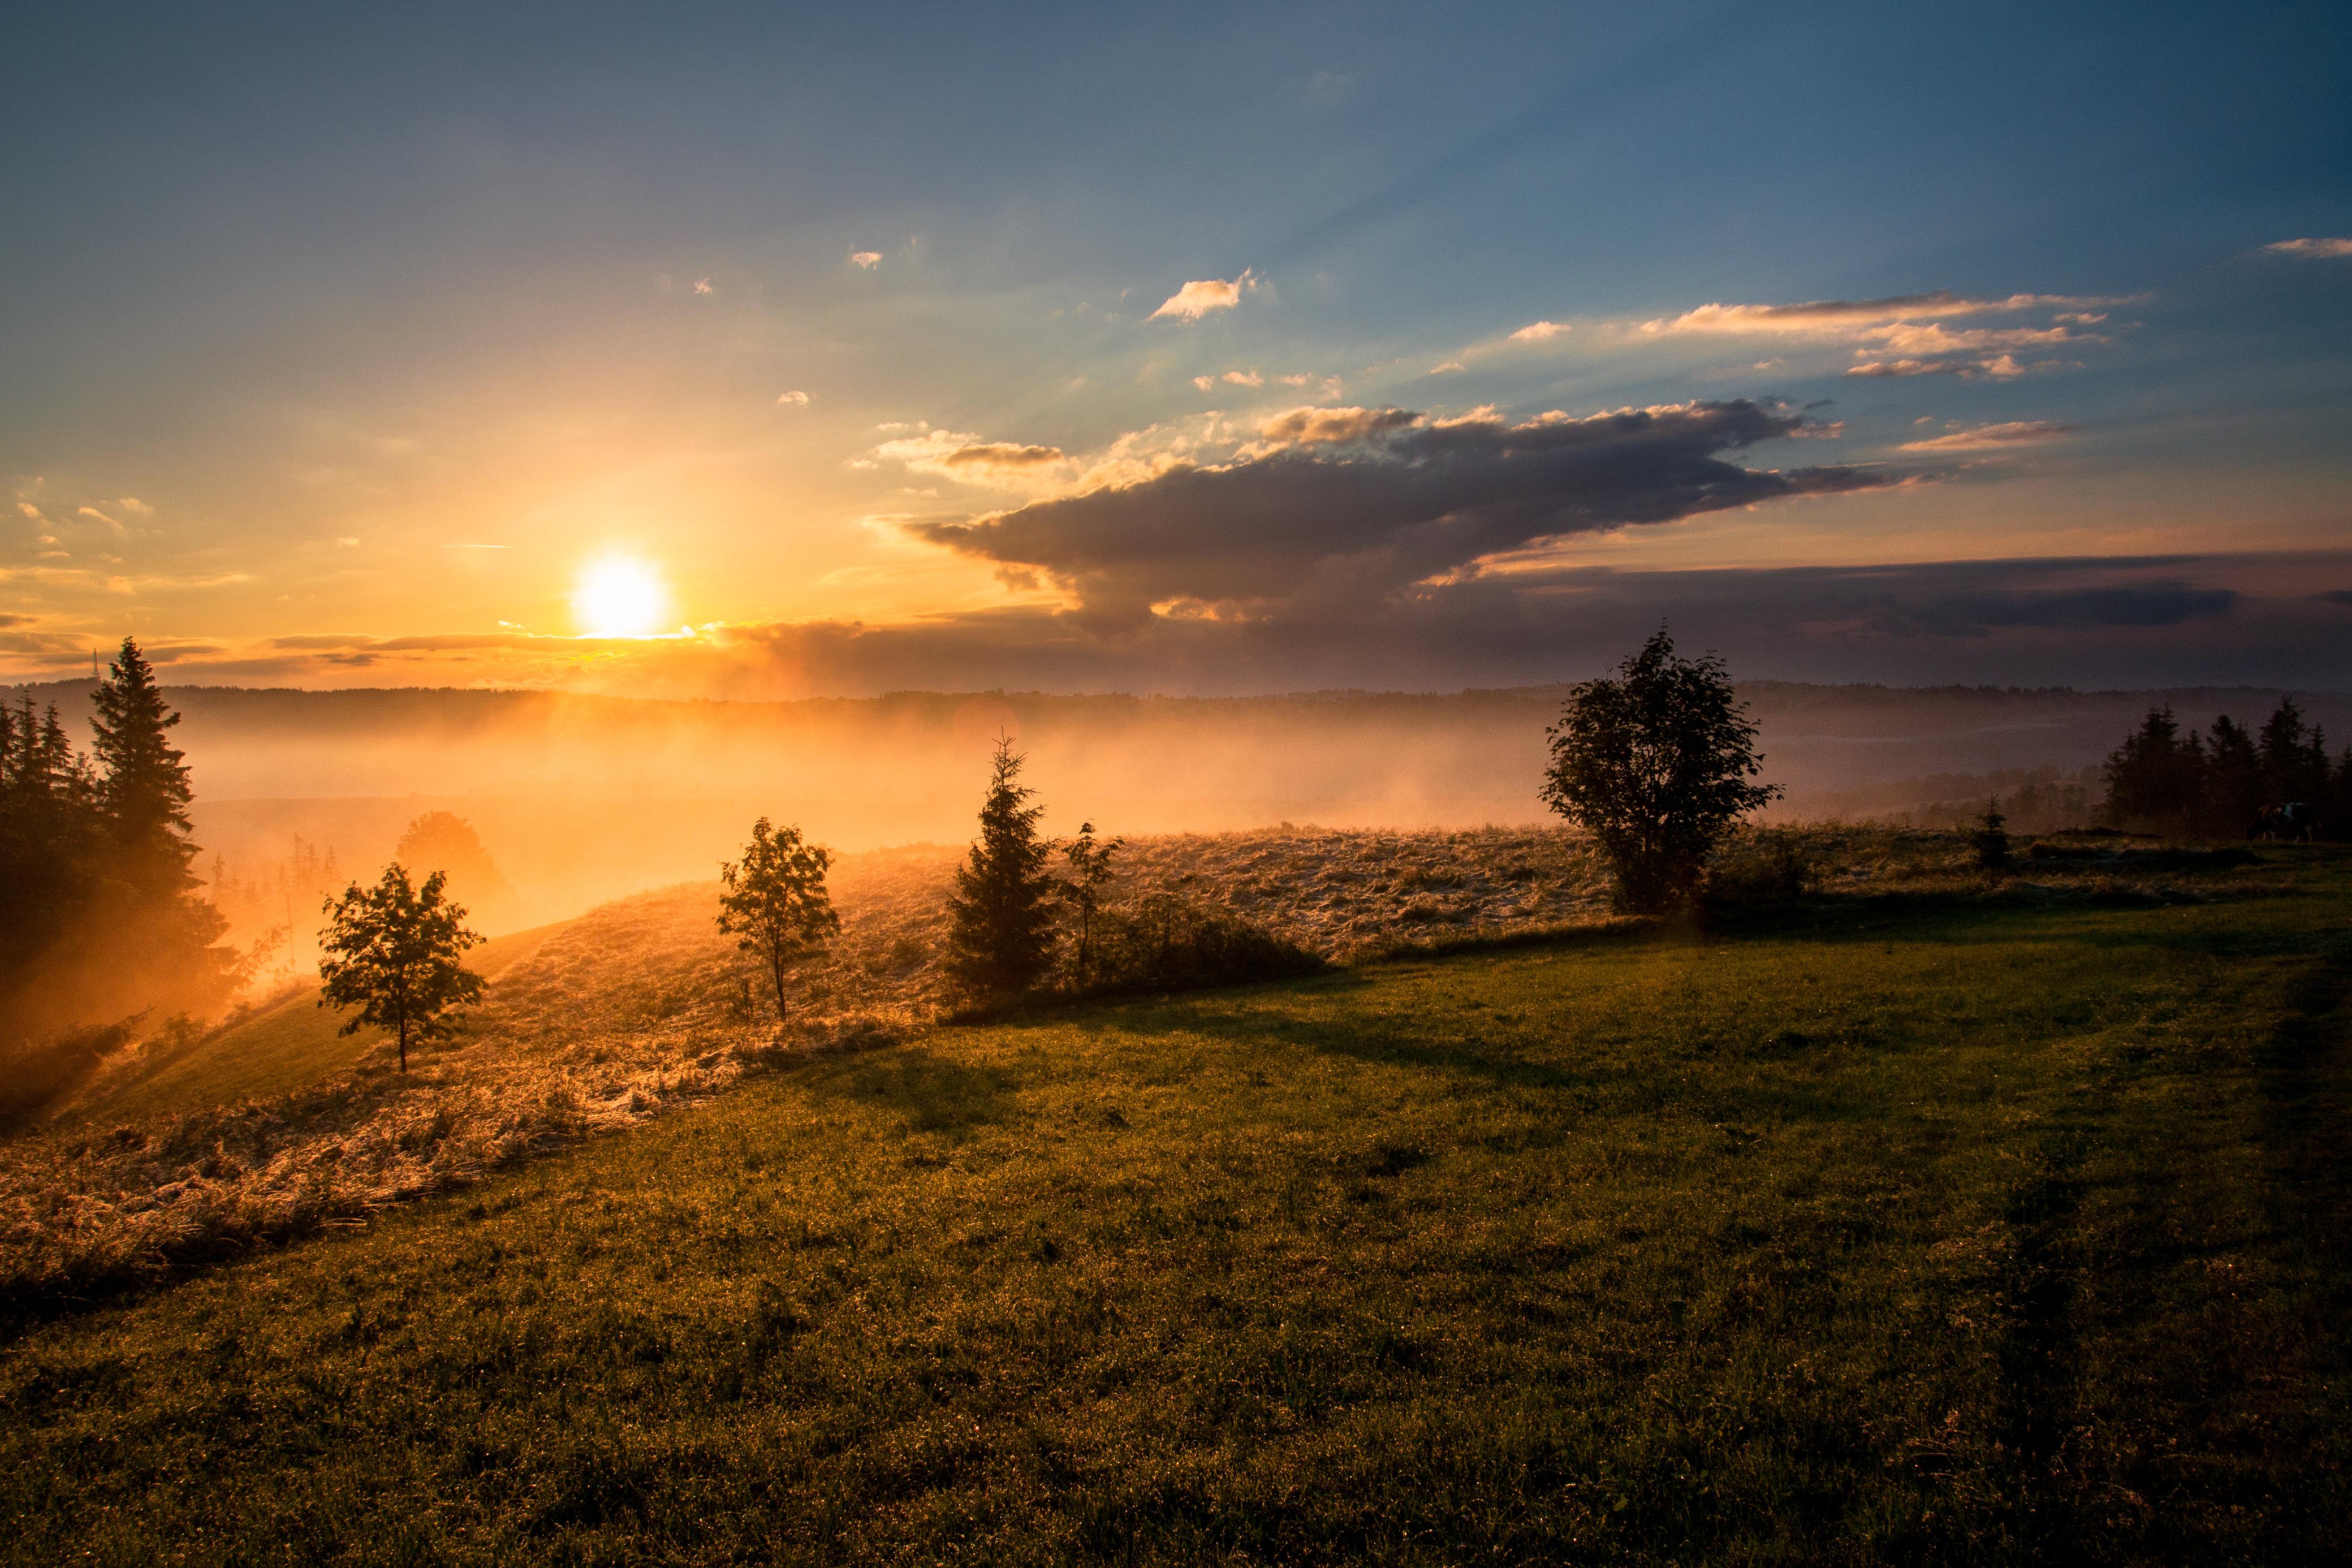 закат склон sunset the slope  № 1569322 загрузить